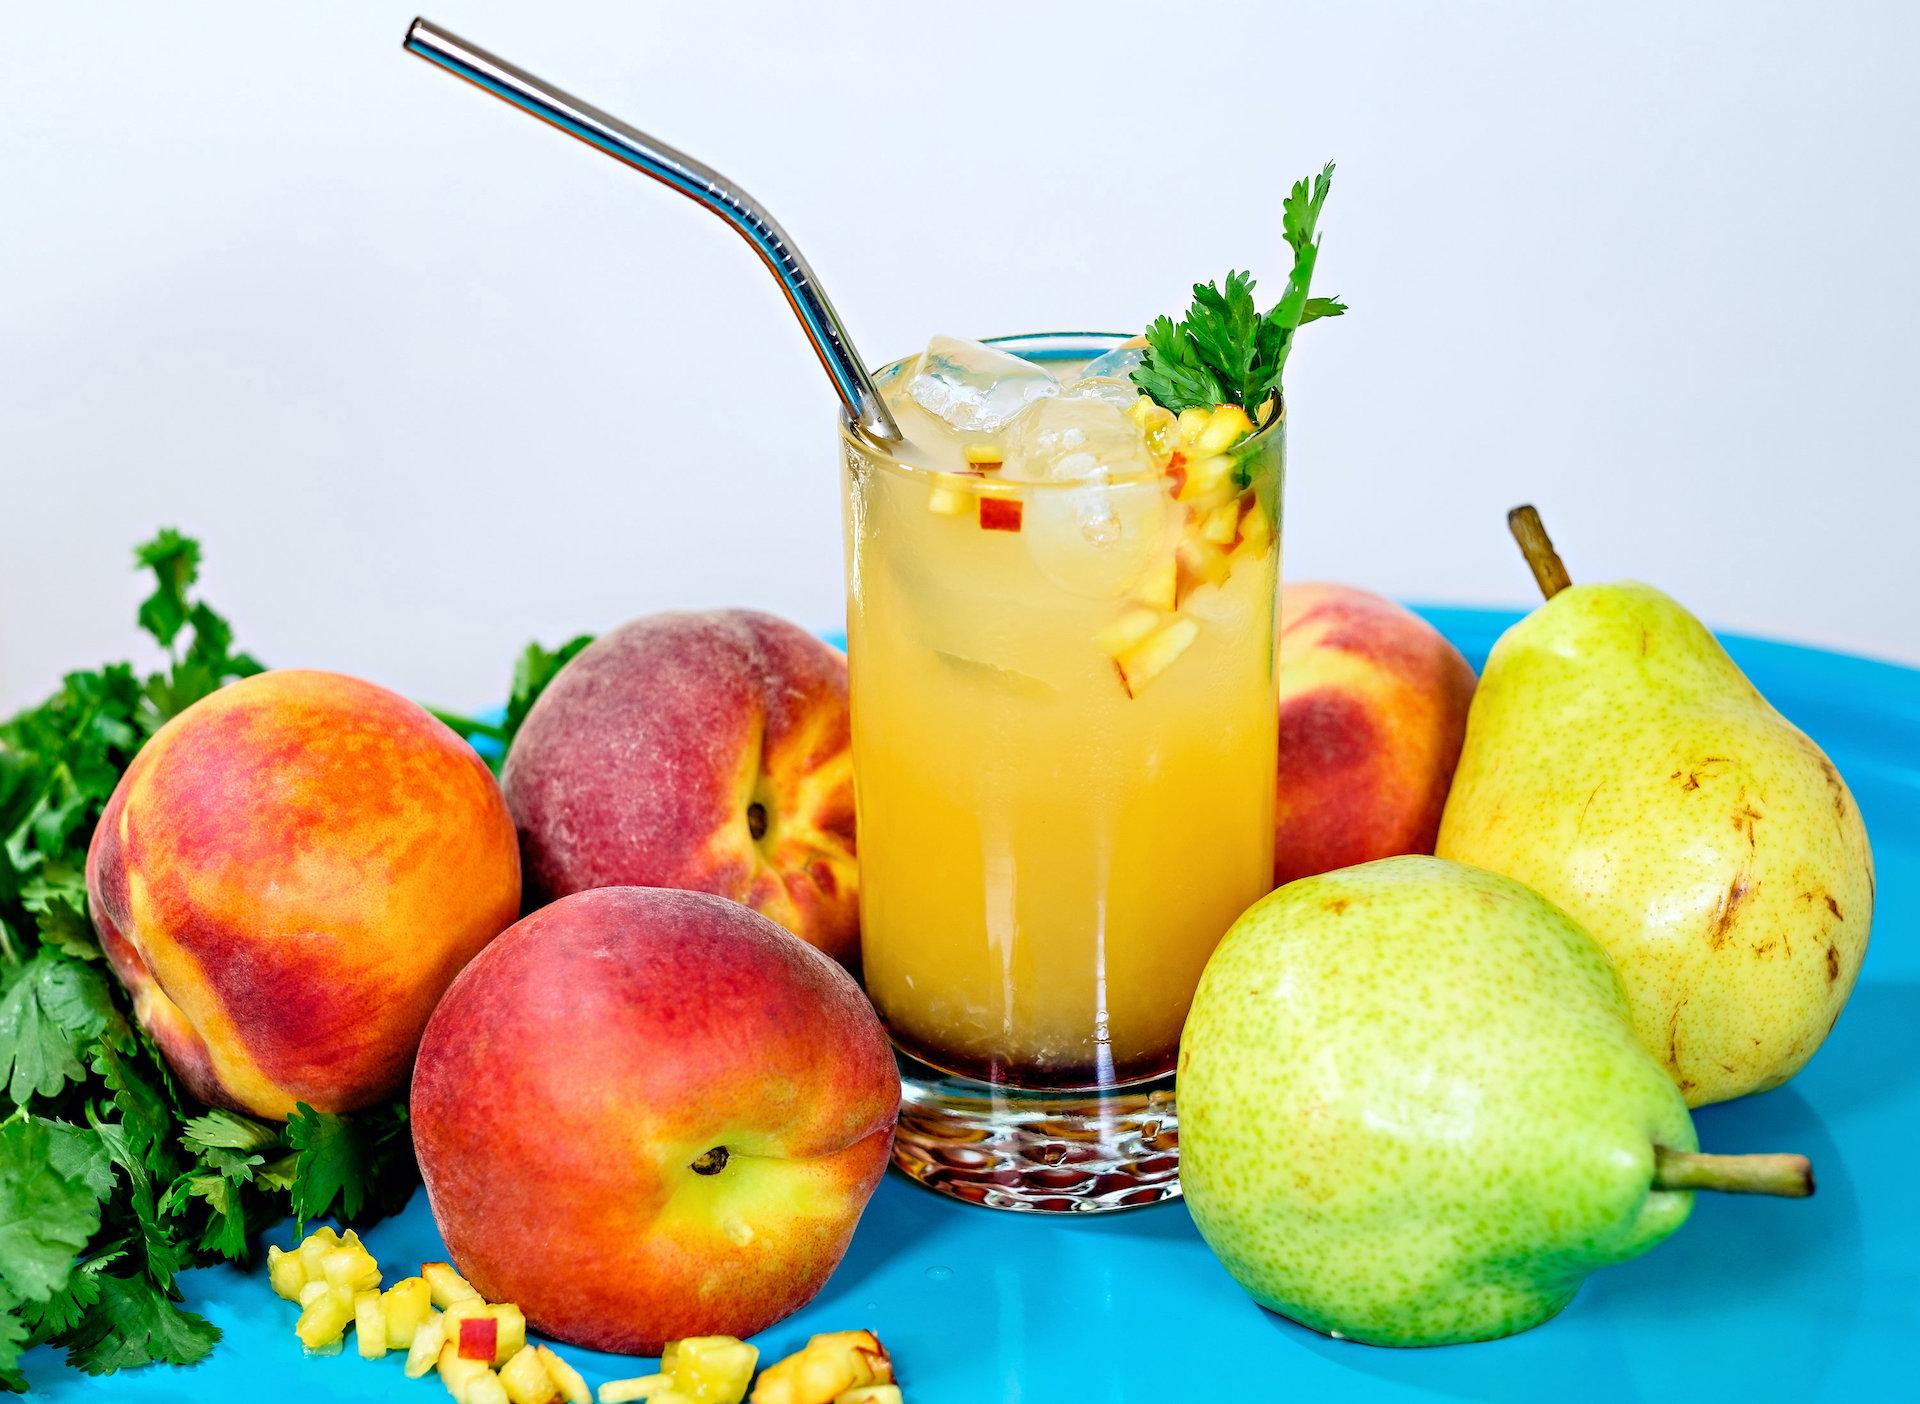 Inspiring Spirits - Summer Box - Passion Fruit Margarita